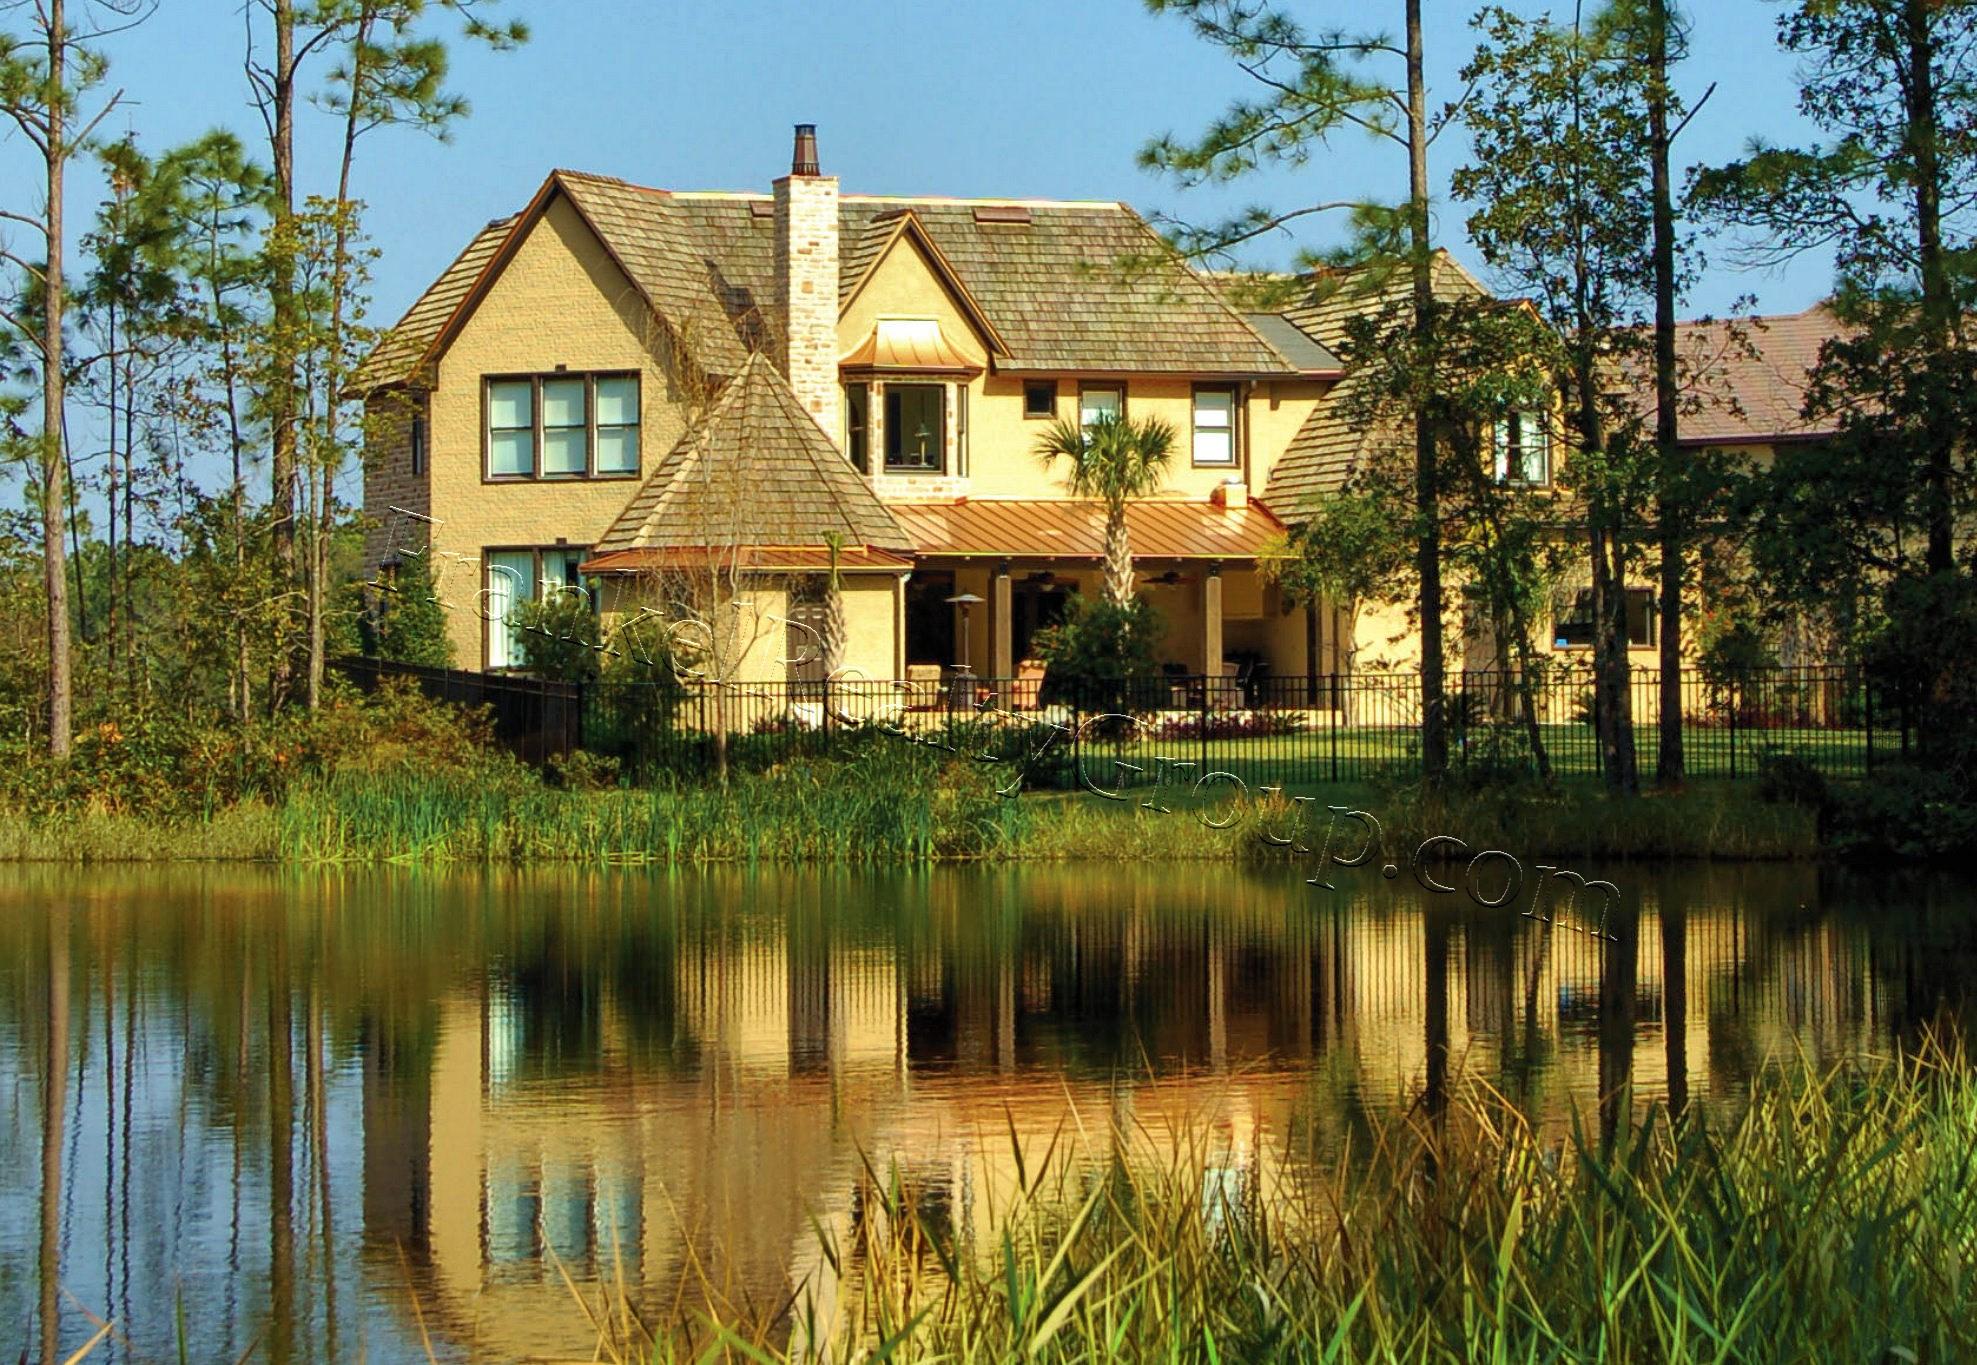 Pablo Creek Reserve Homes For Sale In Jacksonville Fl